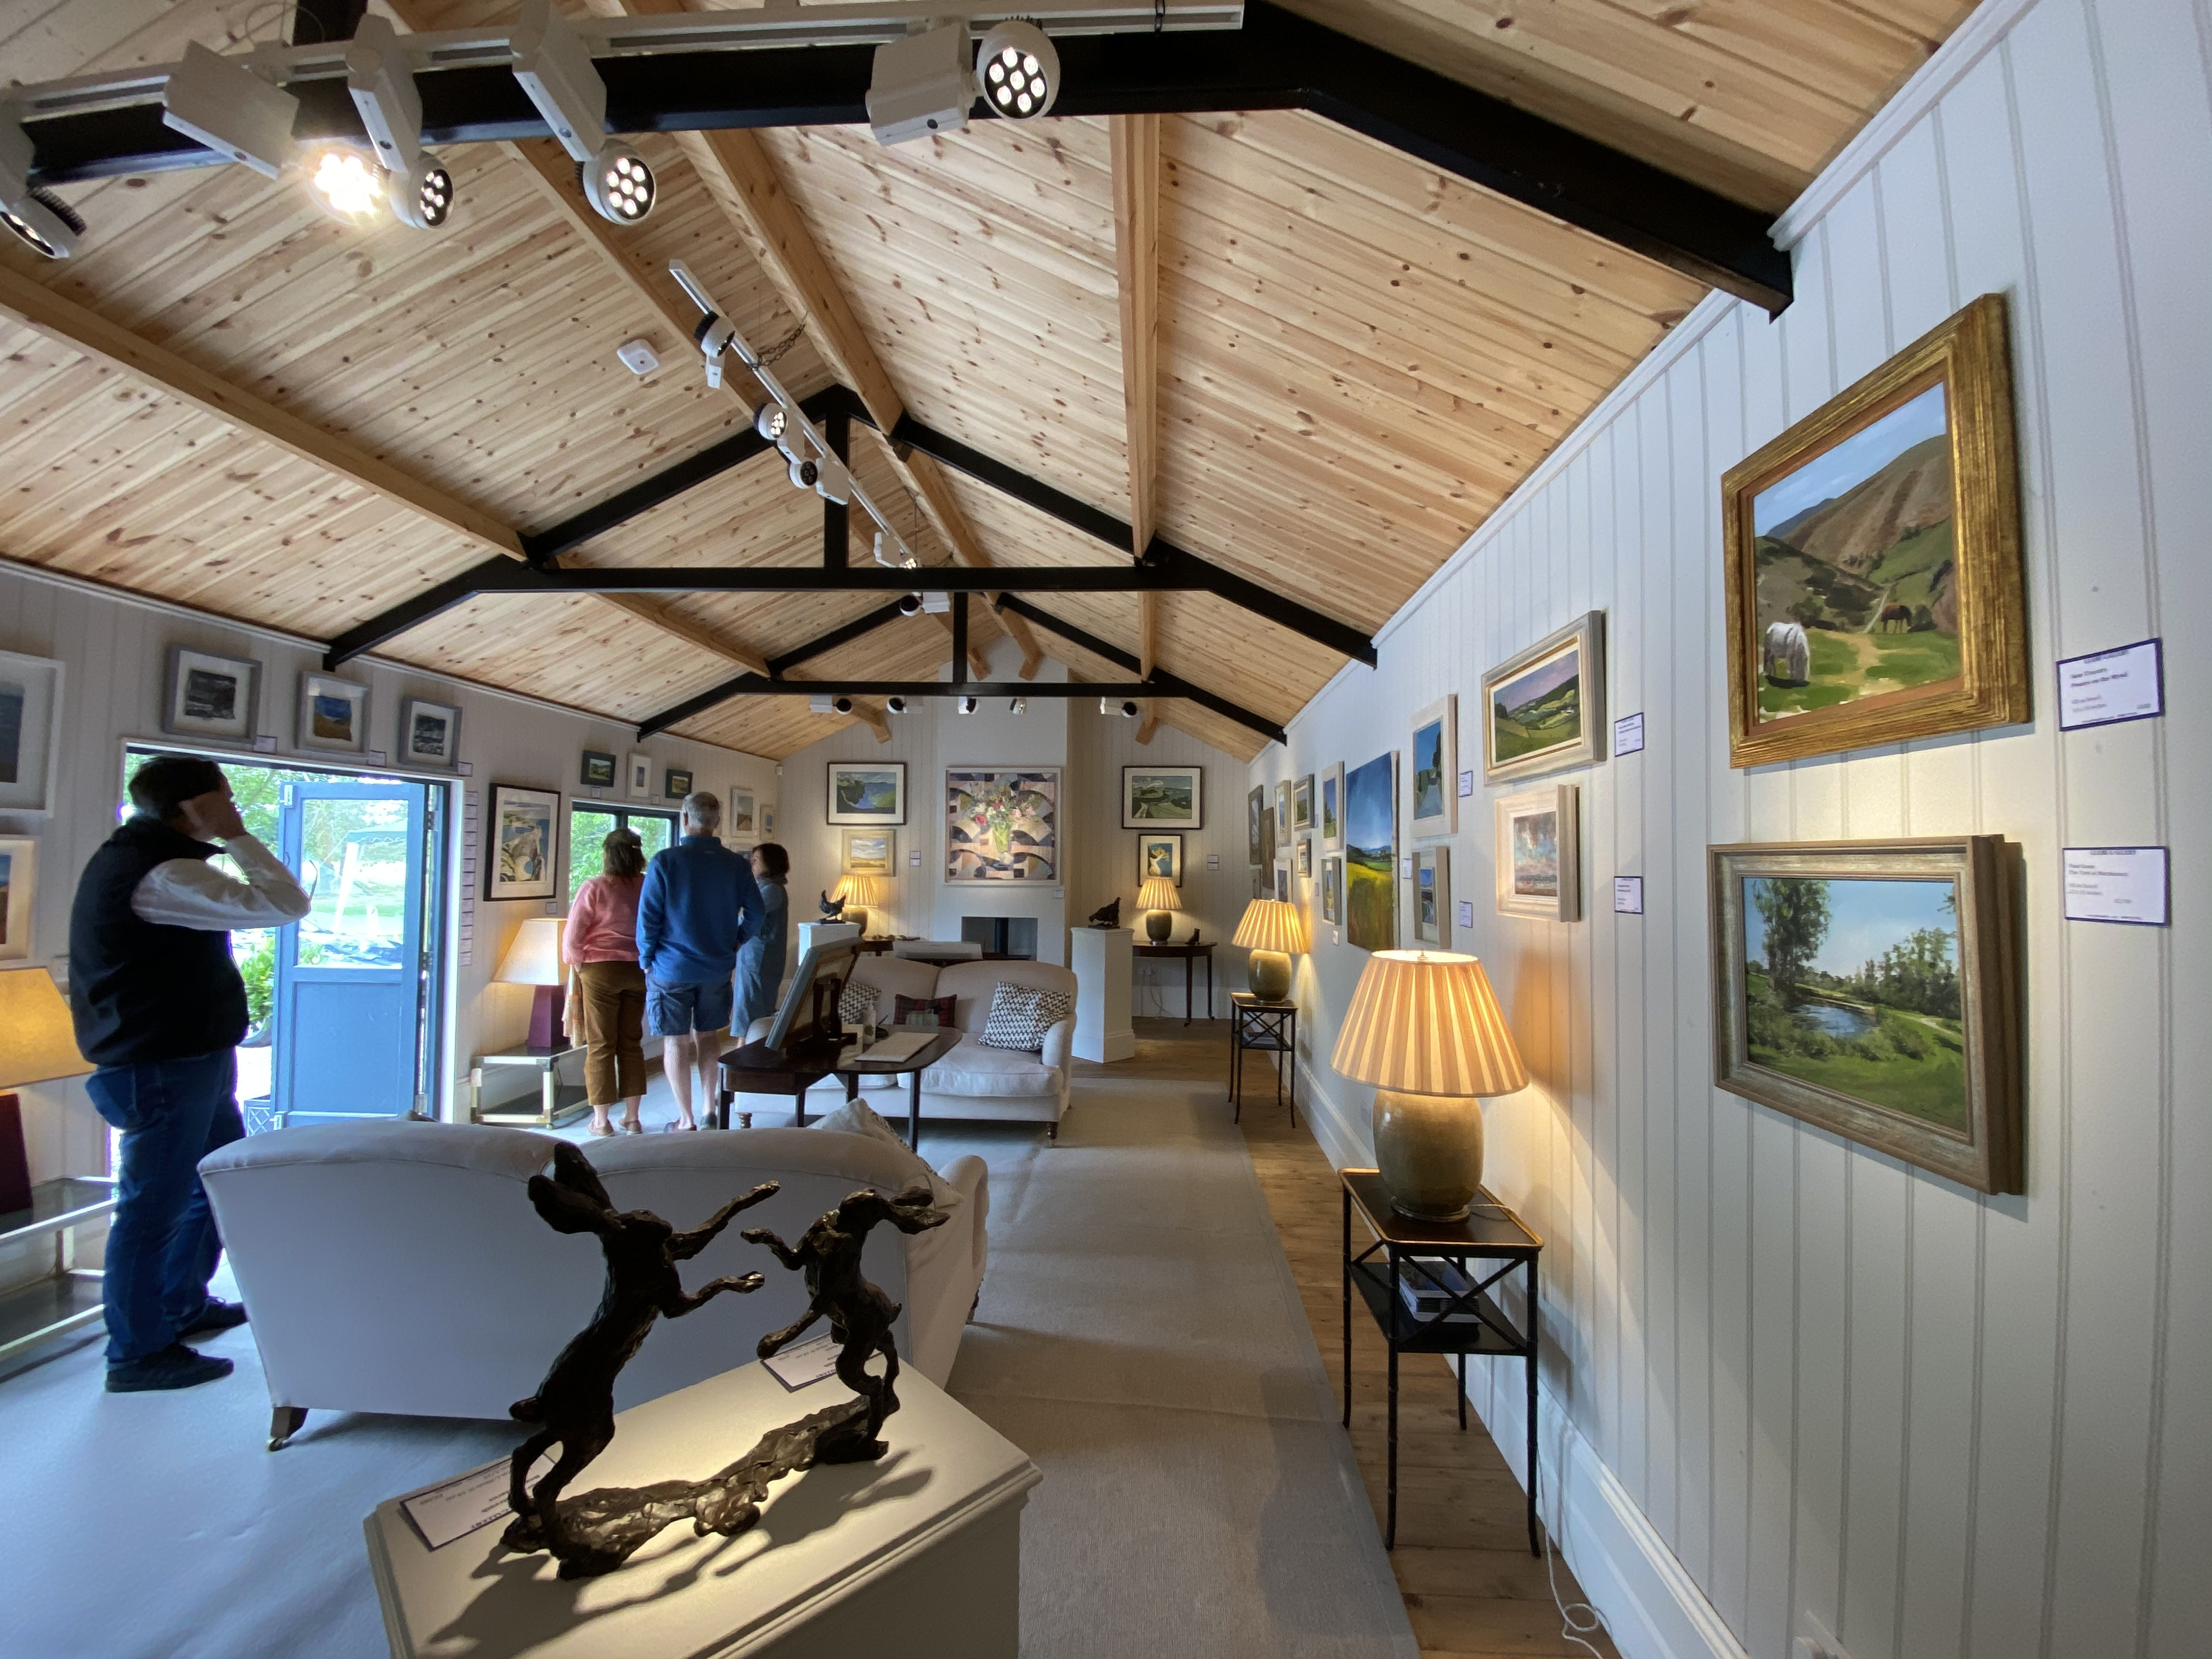 The Glebe Gallery Summer Exhibition 2020